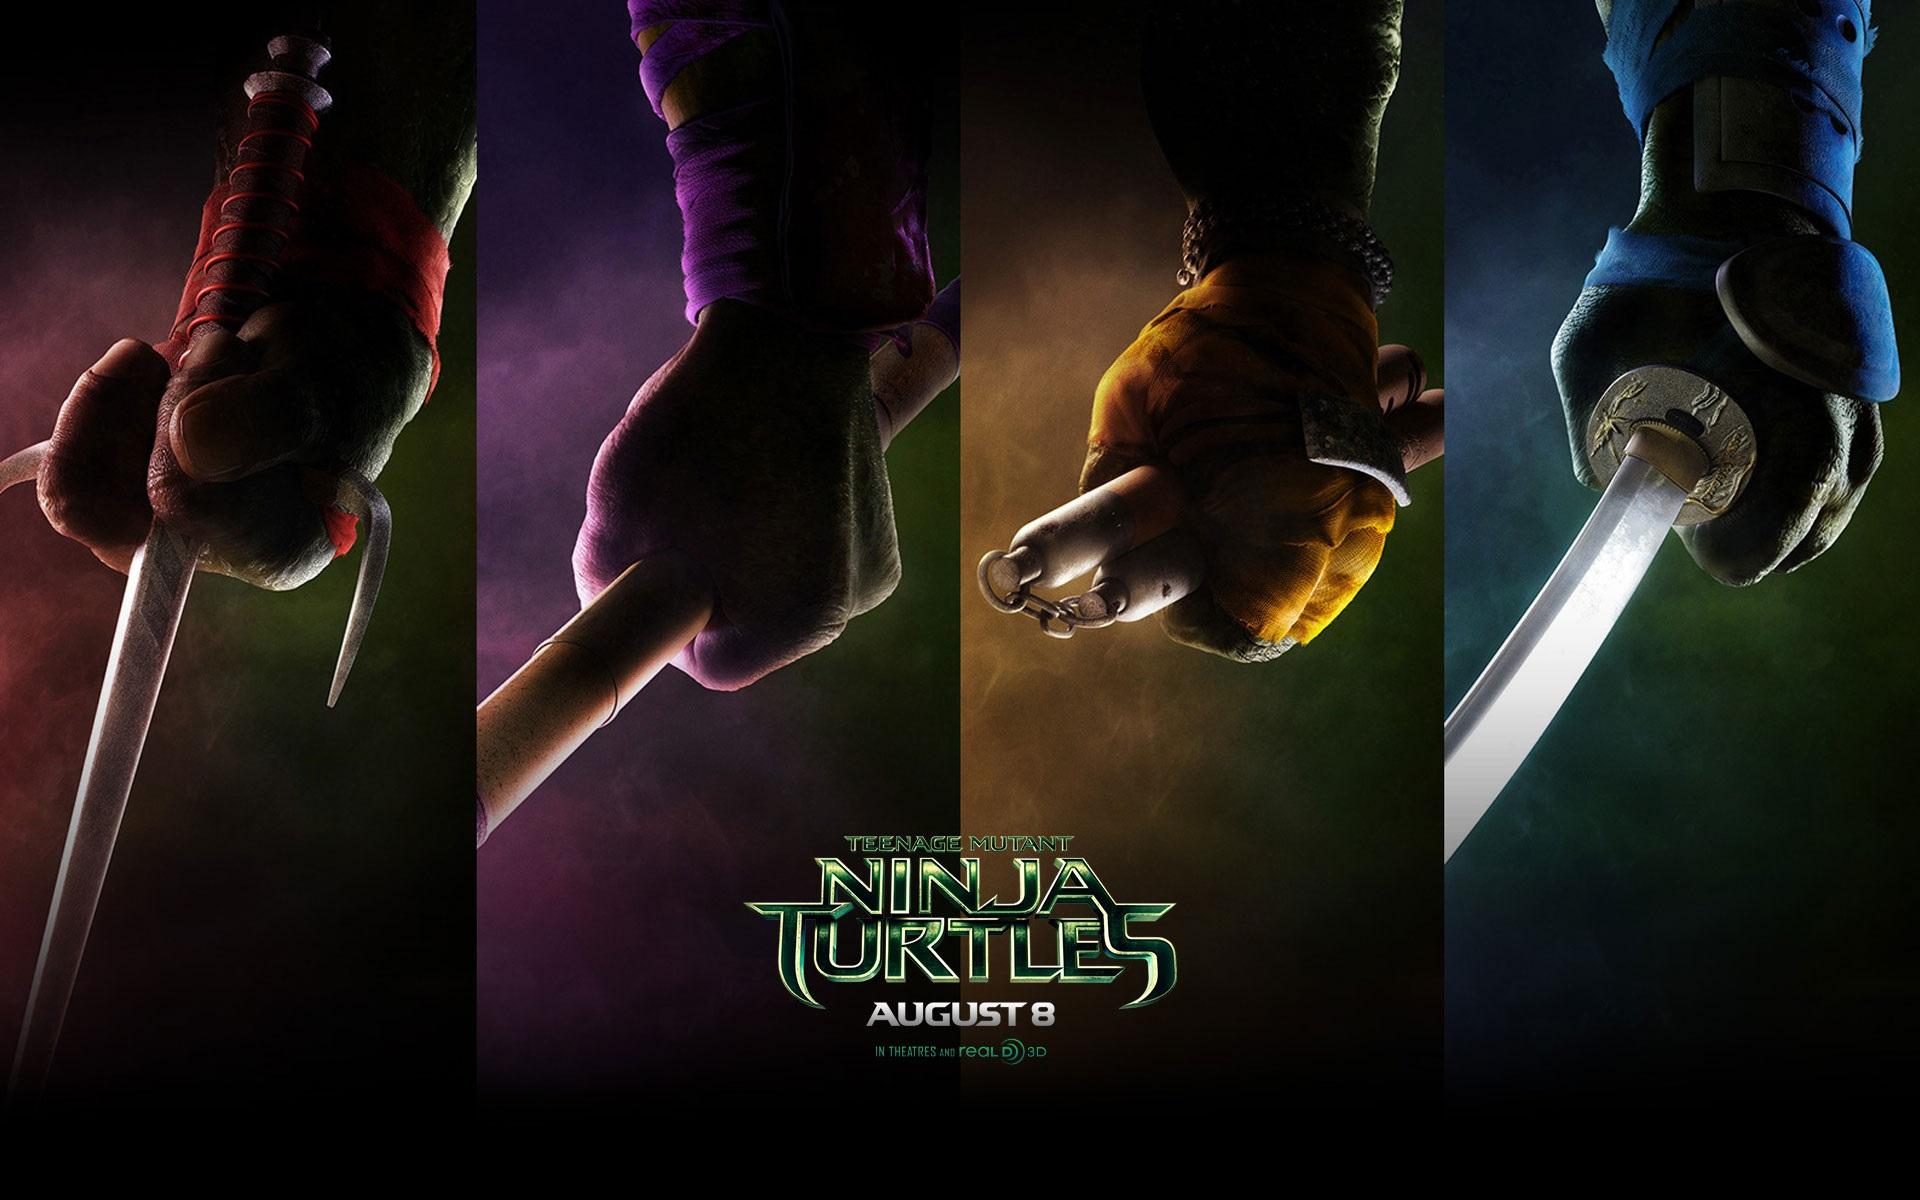 Wallpaper Teenage Mutant Ninja Turtles Hd 1920x1200 Hd Picture Image